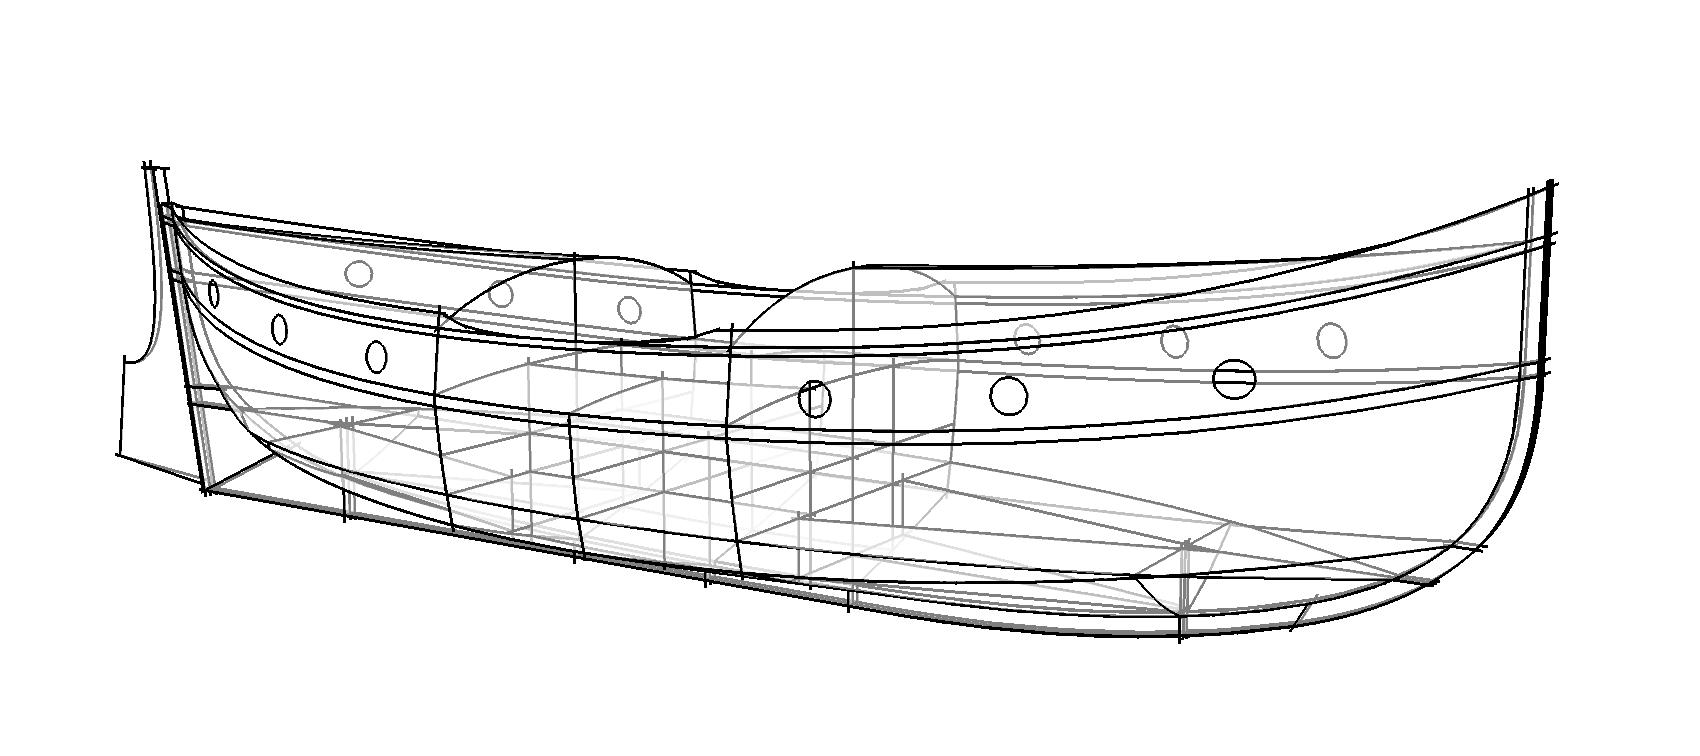 44' VALHALLA - A Pelagic Sailing Yacht